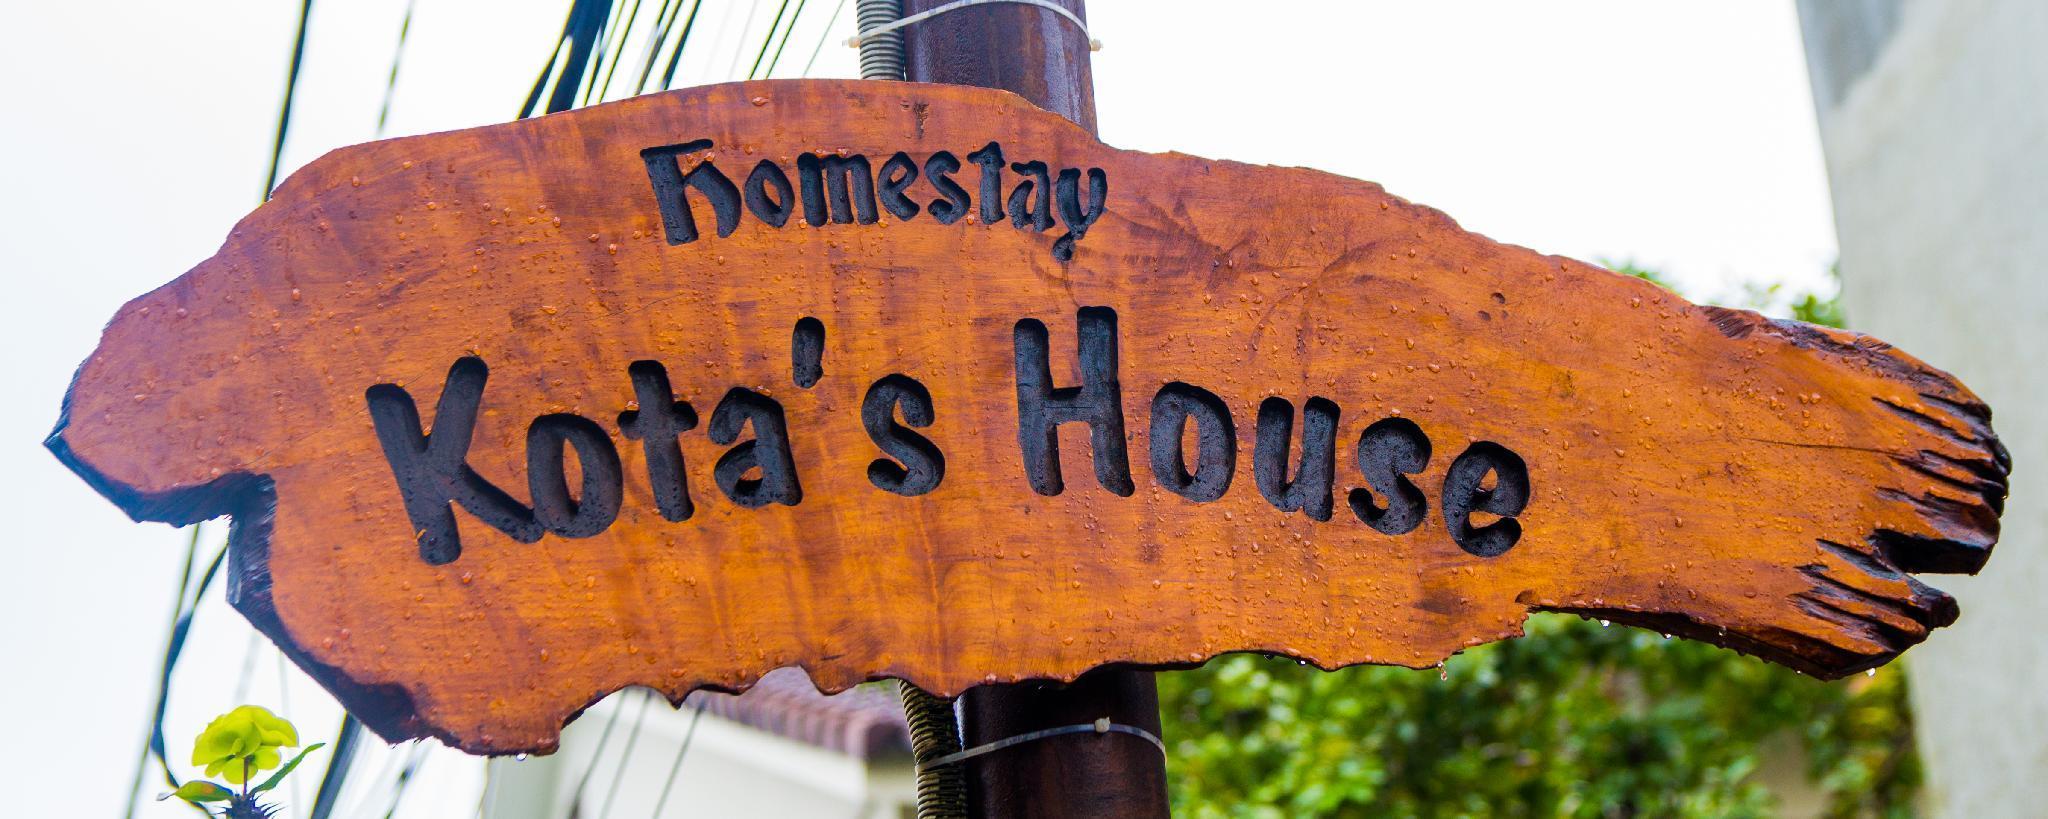 Kota's House